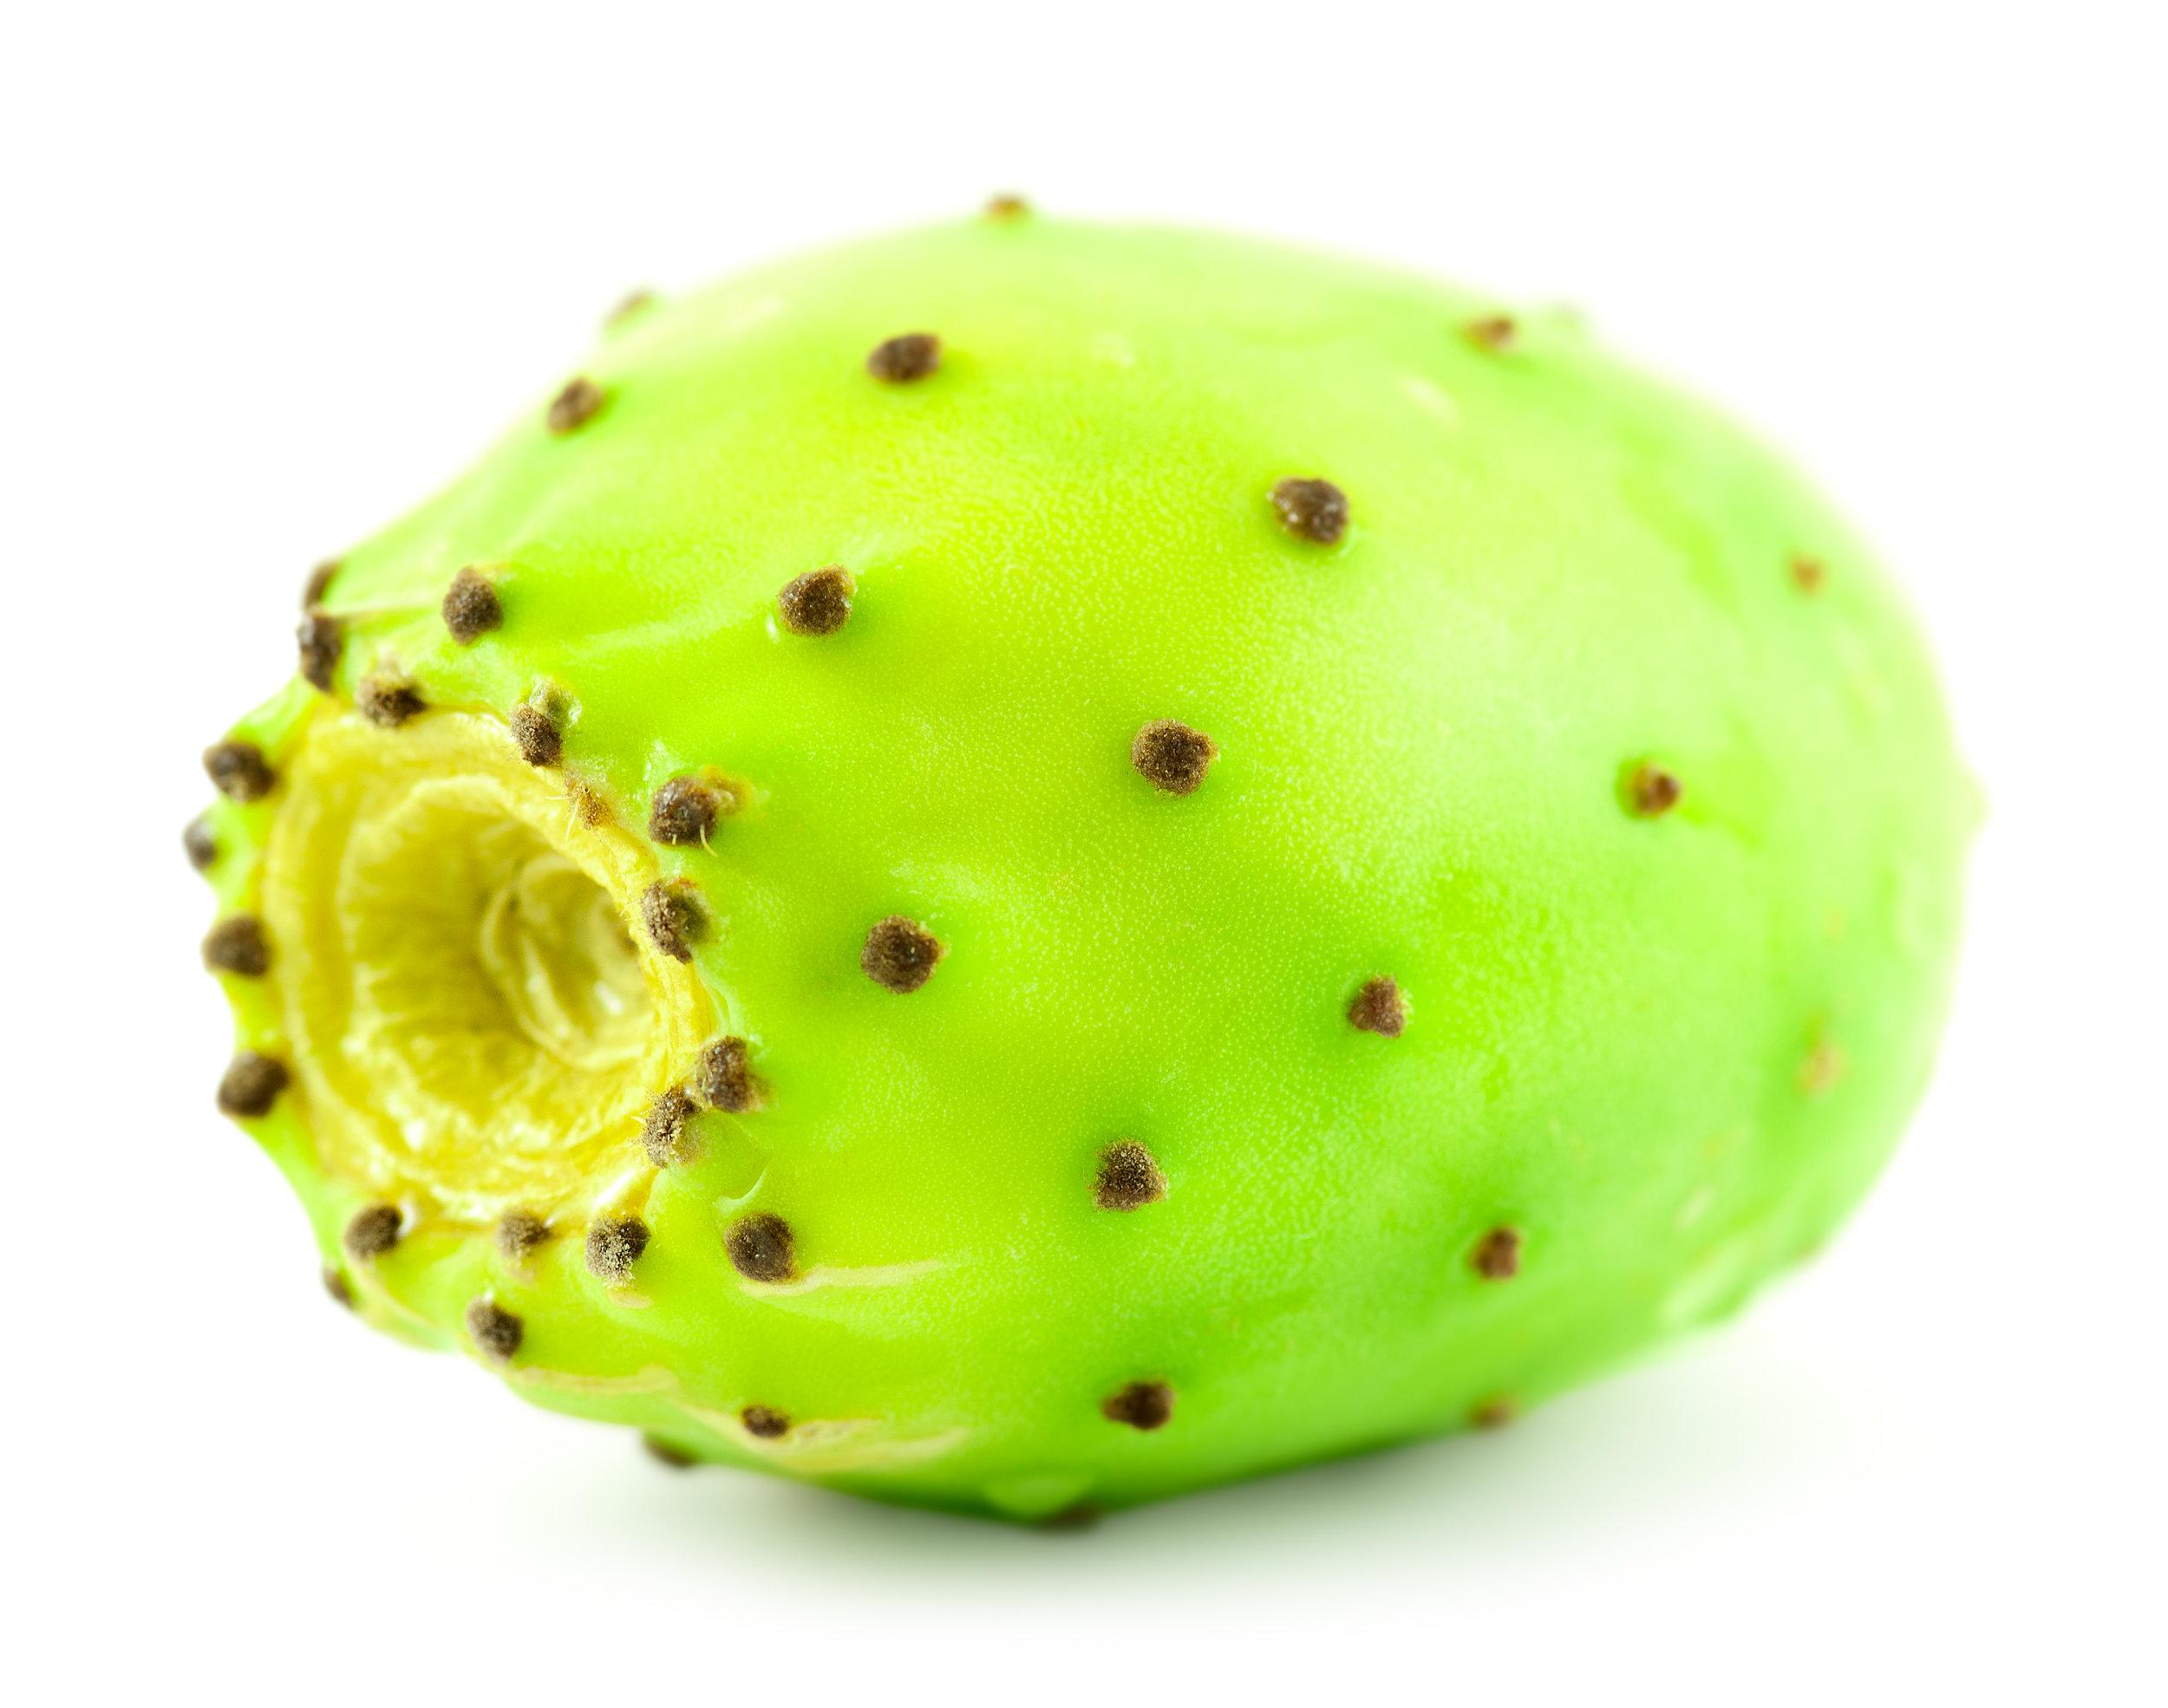 Green Cactus Pears